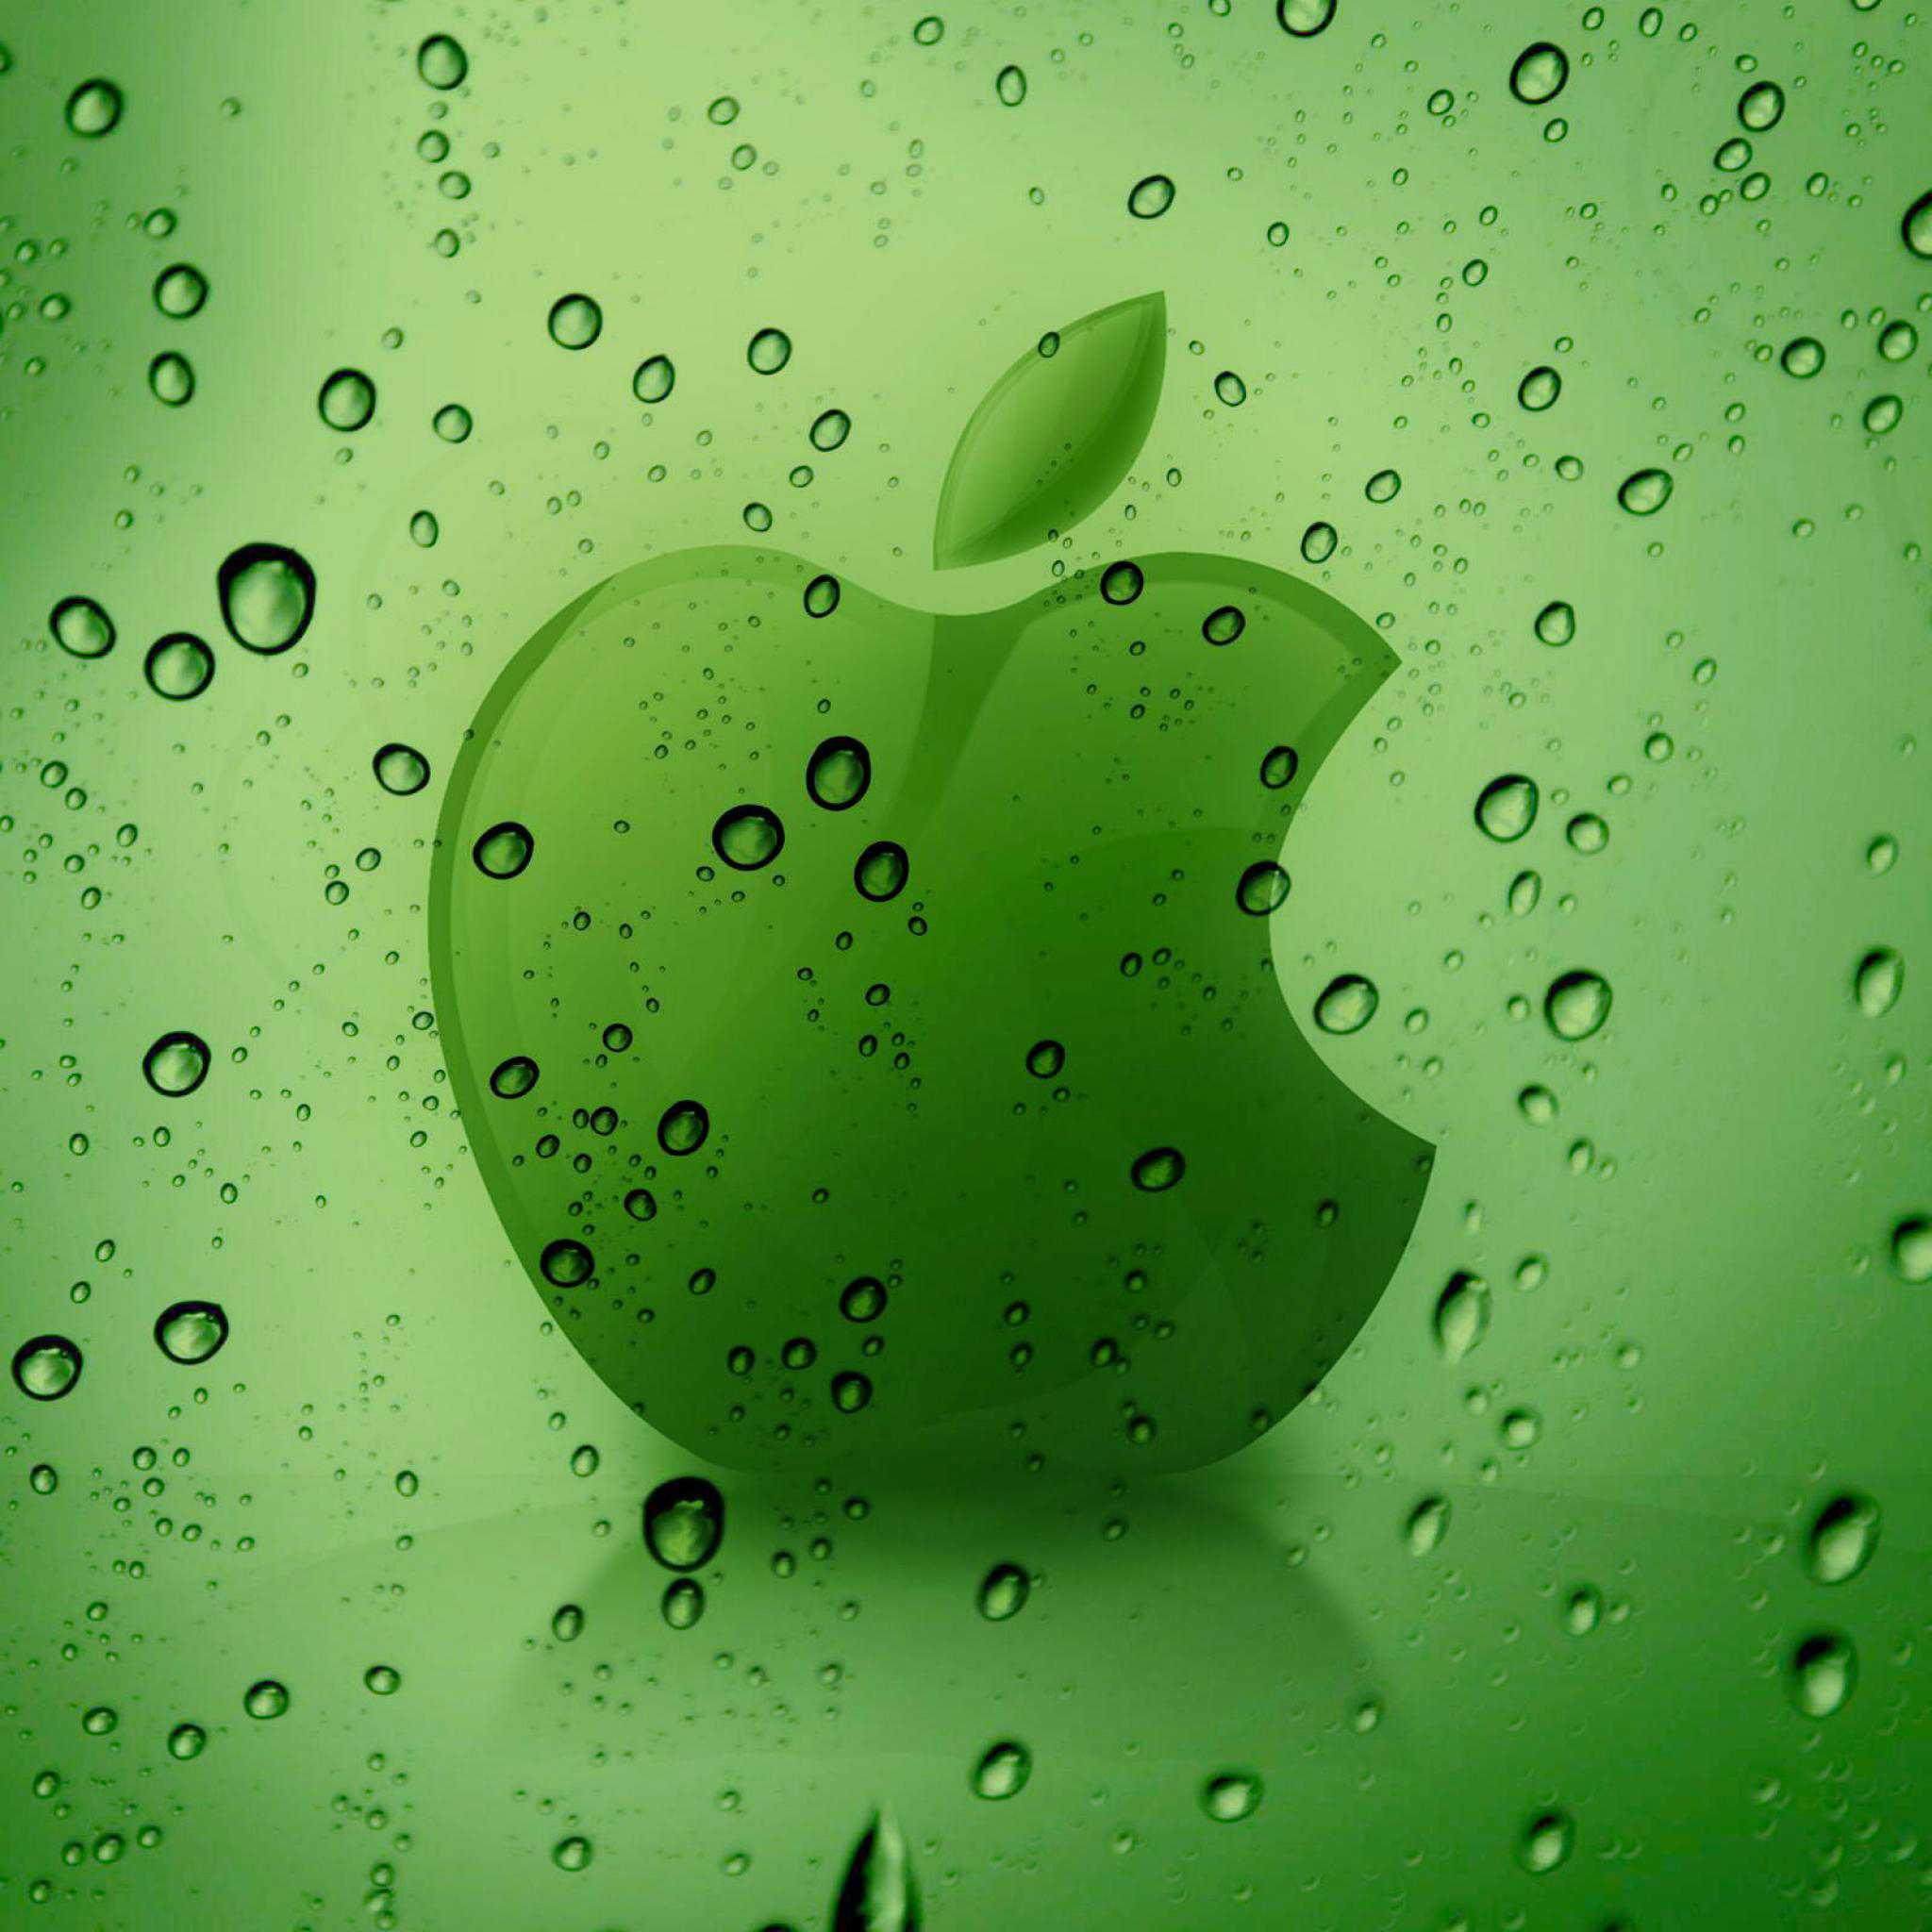 Green-Apple-Logo-3Wallpaper-iPad-Retina